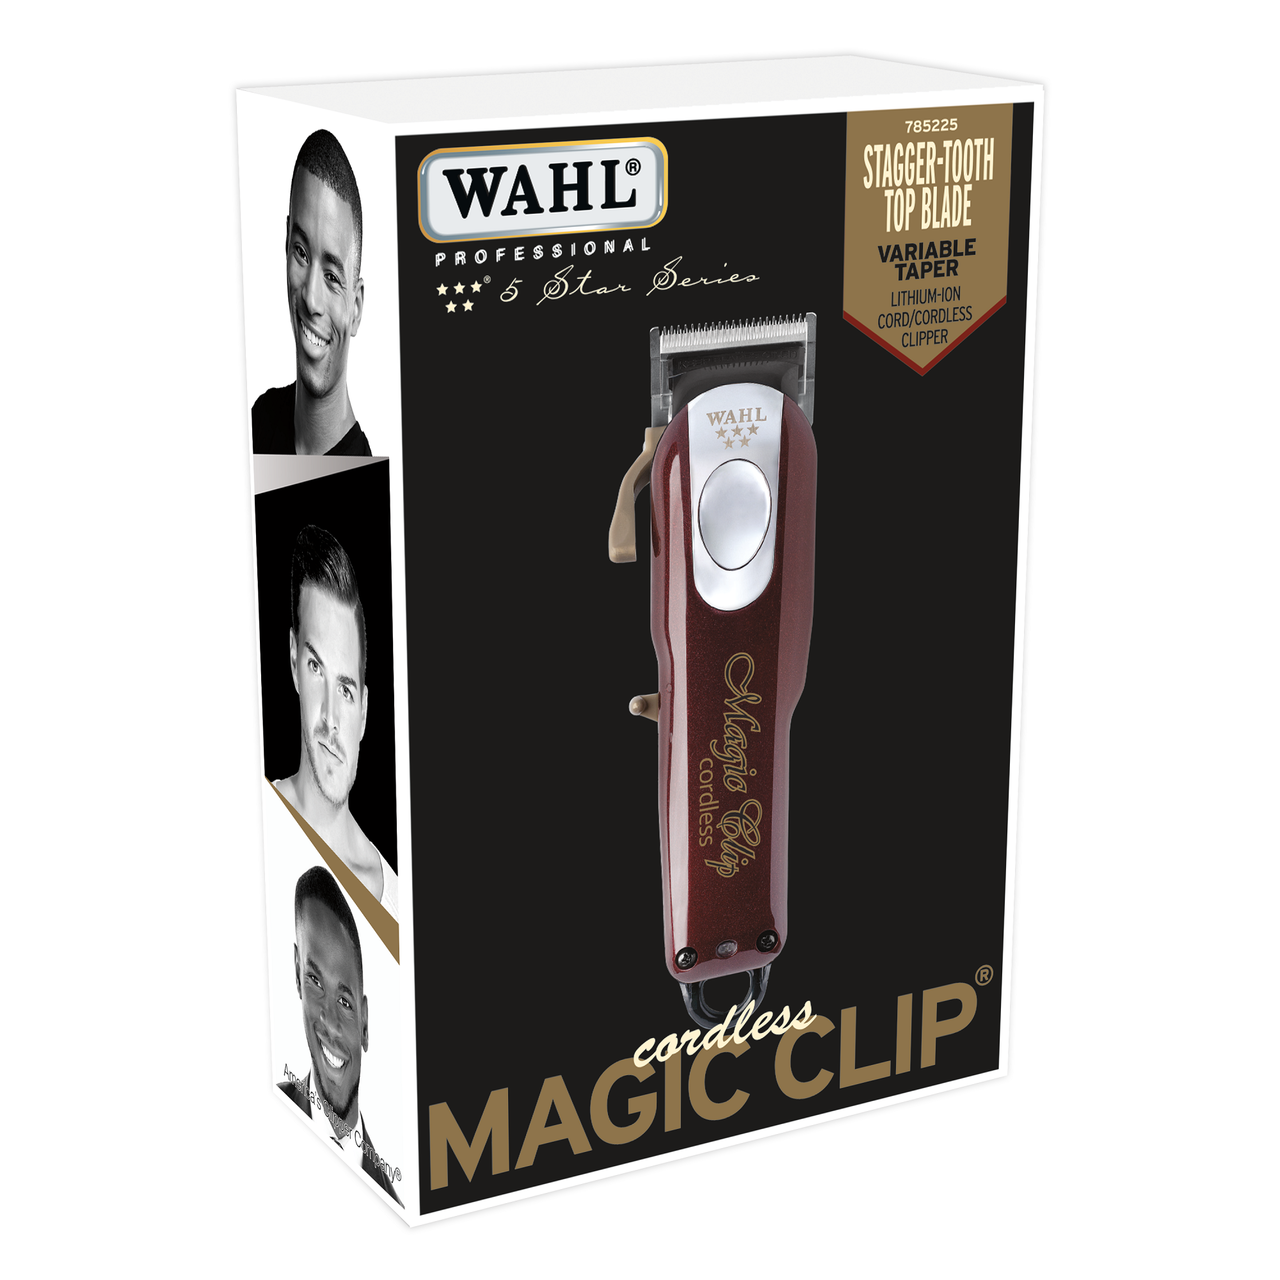 Wahl Cordless Magic Clip Clipper 5 Star Series